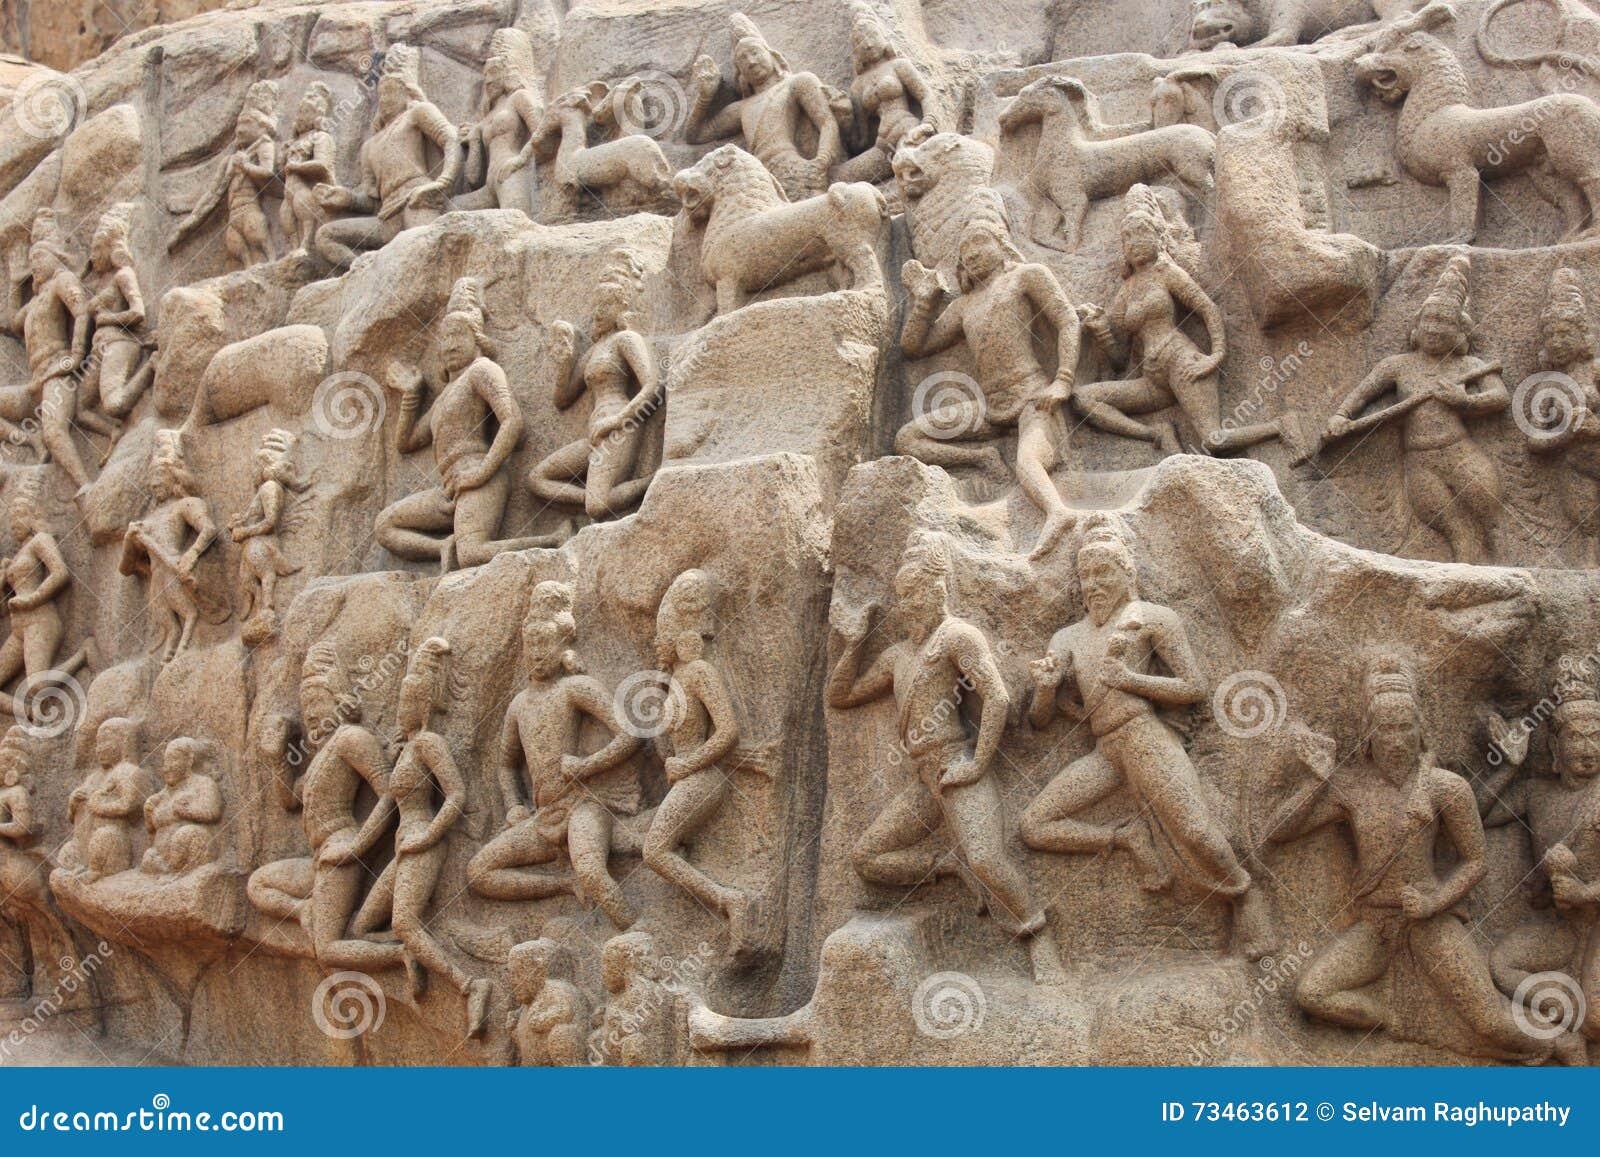 Mahabalipuram Cave Sculpture Stock Photo - Image of ancient